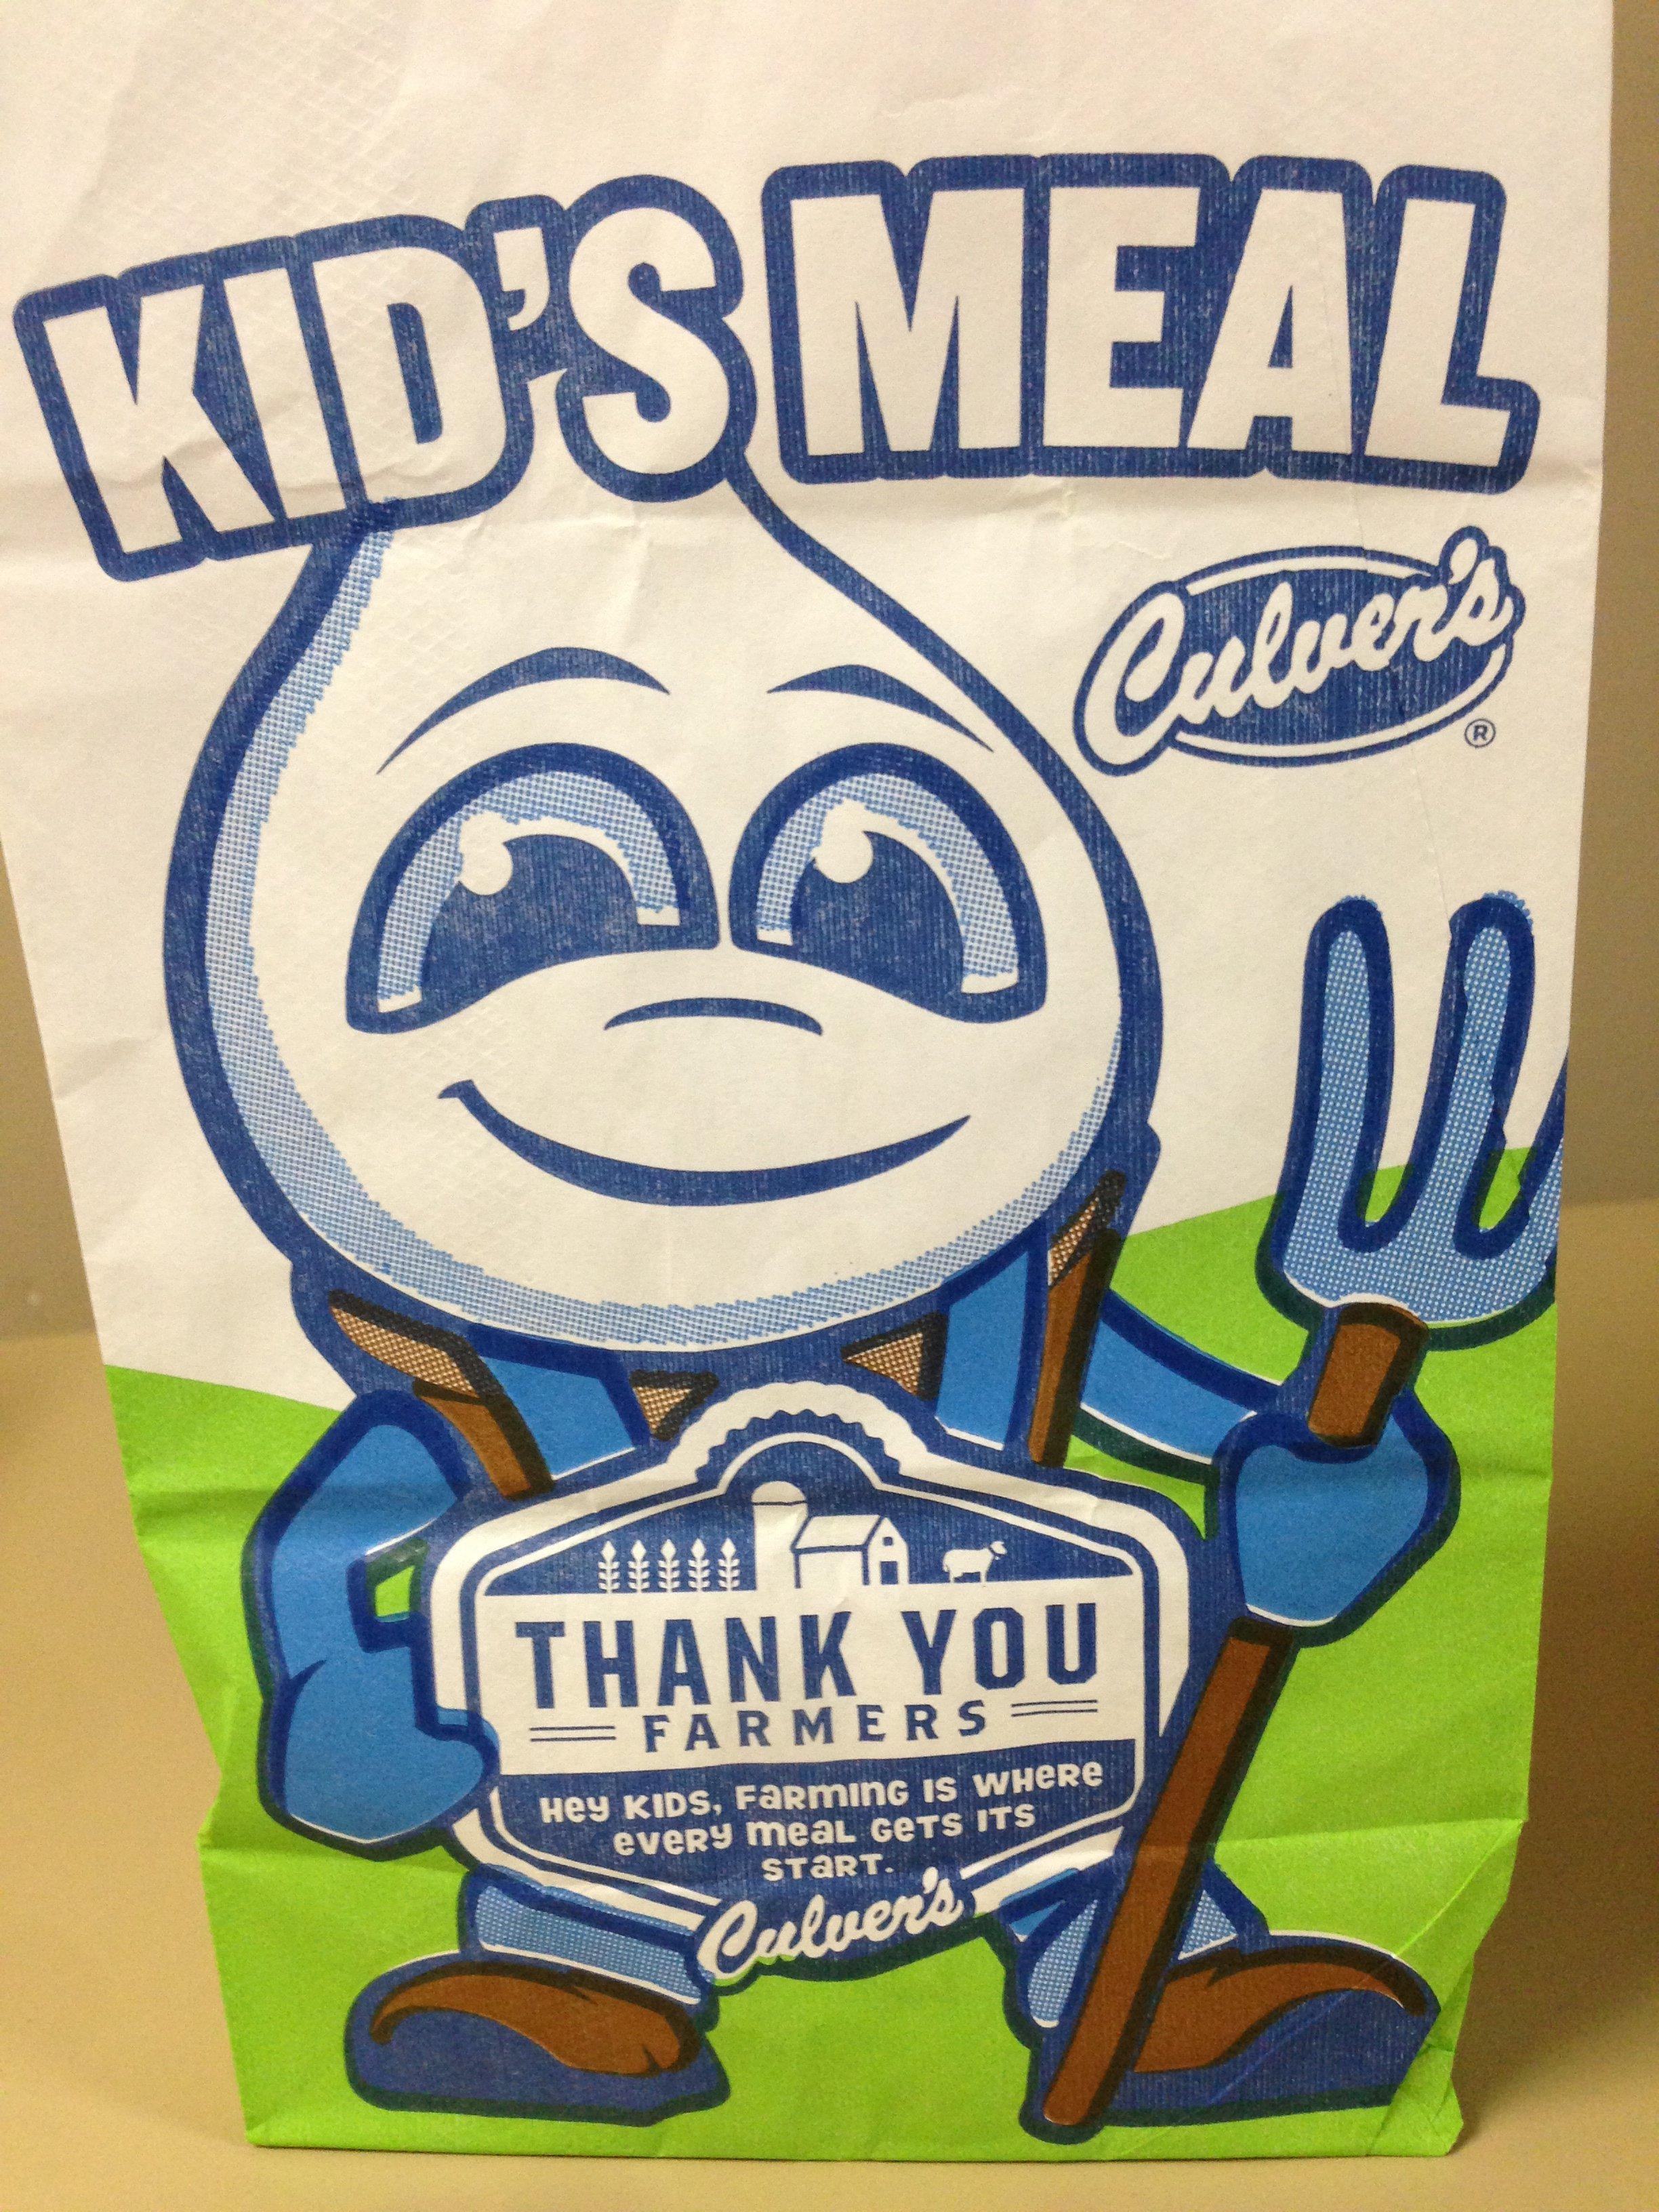 Kids Eat Free Culvers